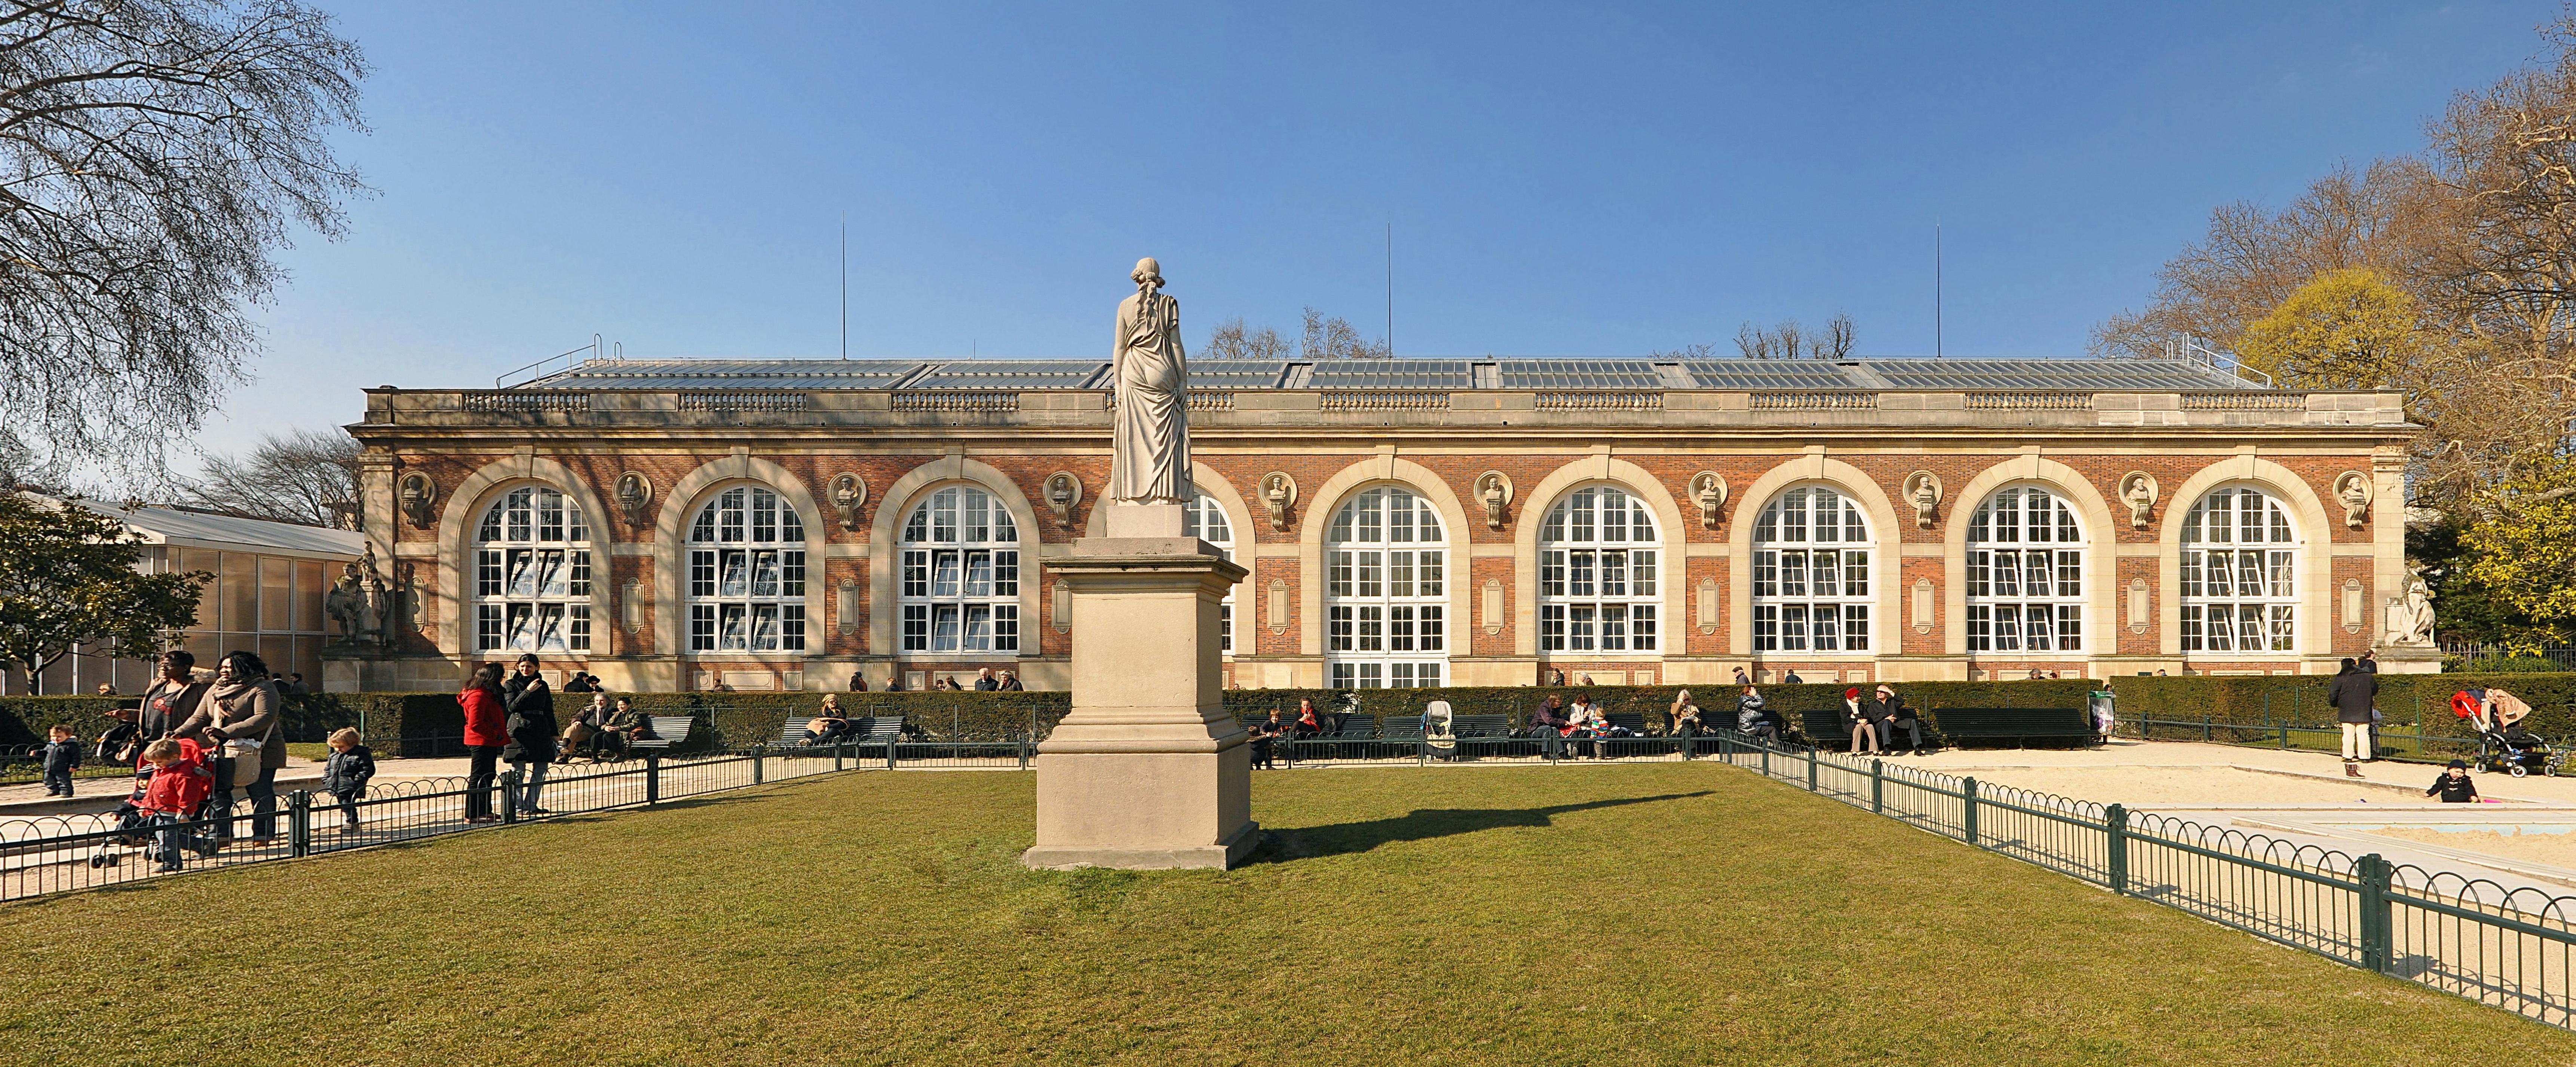 file orangerie du jardin du luxembourg paris ForJardin Orangerie